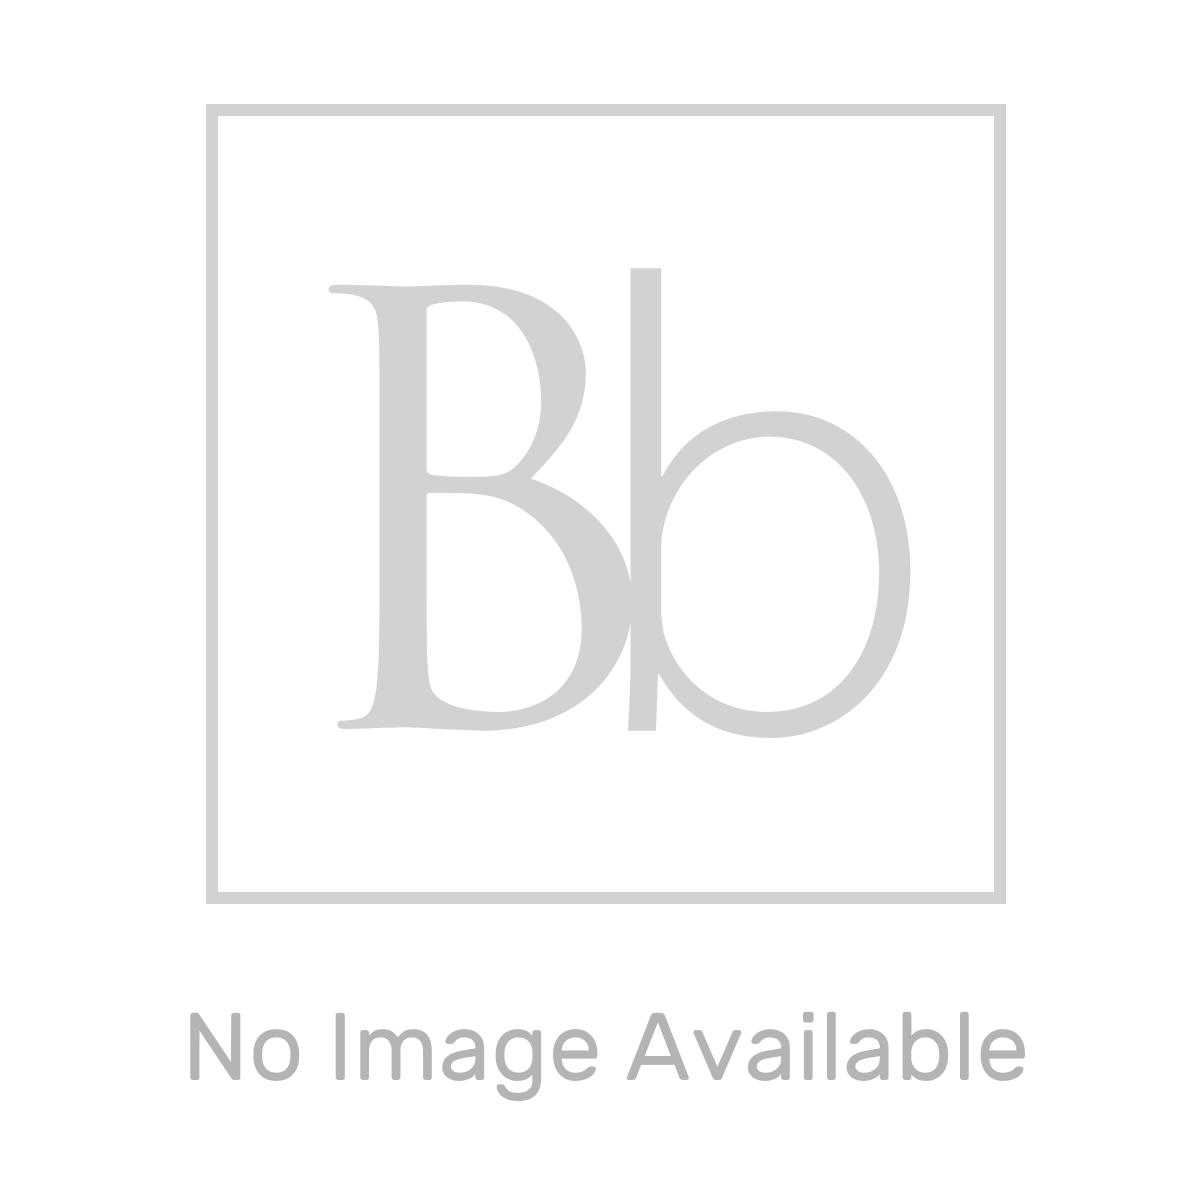 Vitra S20 Wall Hung Toilet1